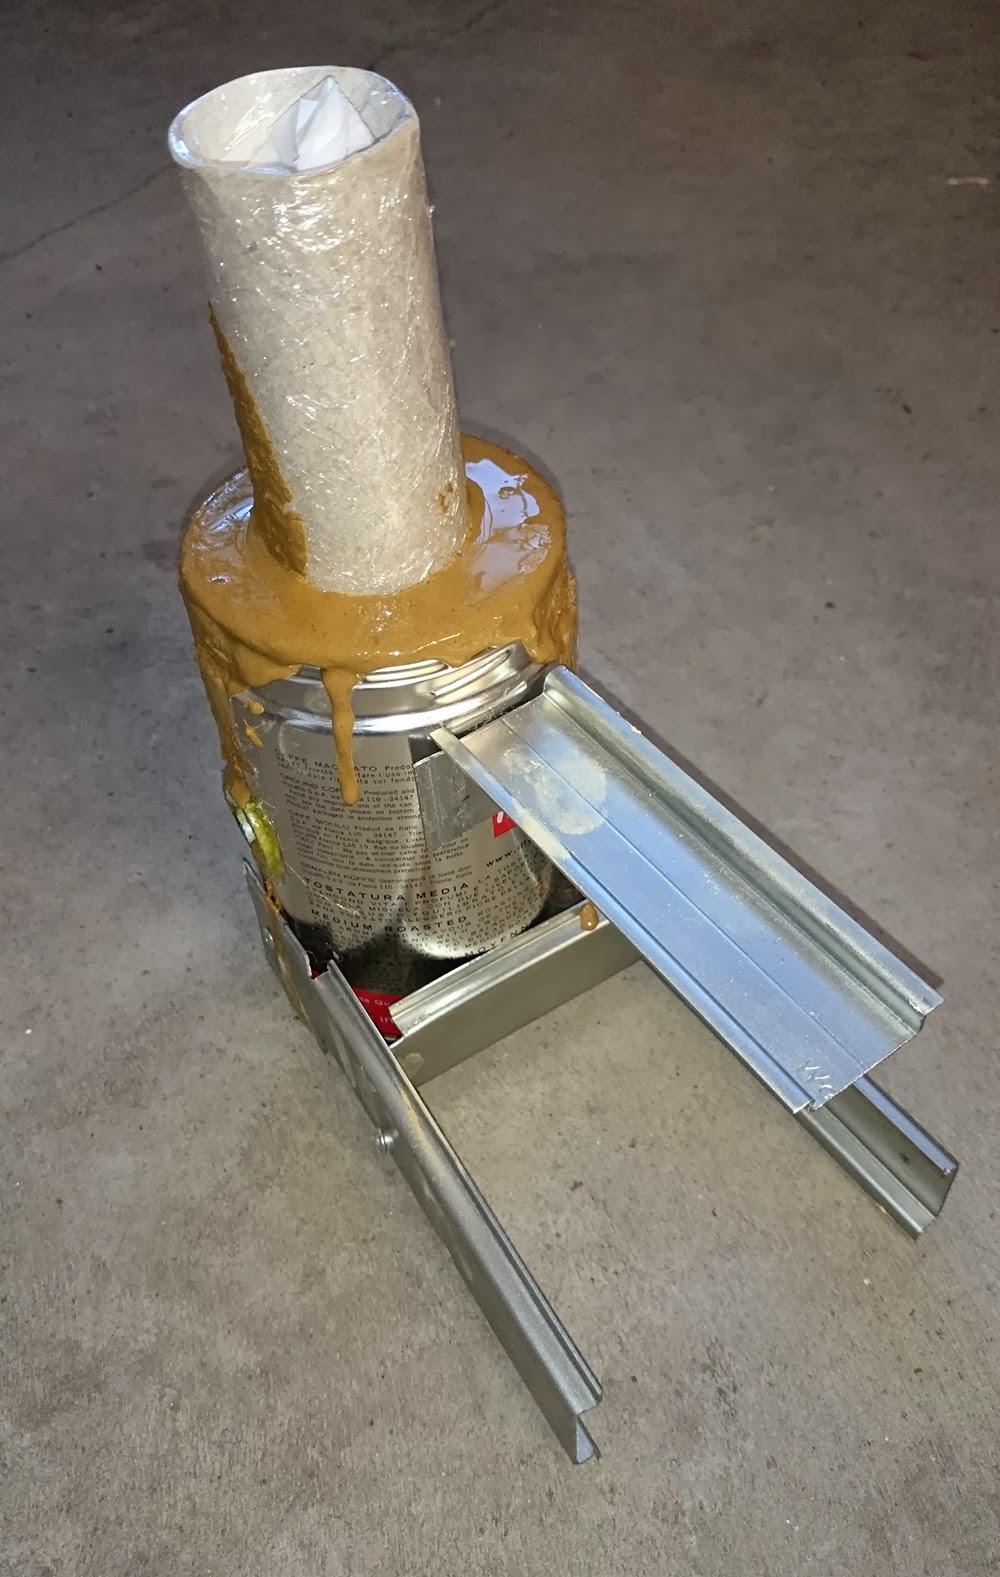 costruzione artigianale miniforgia a gas forgia